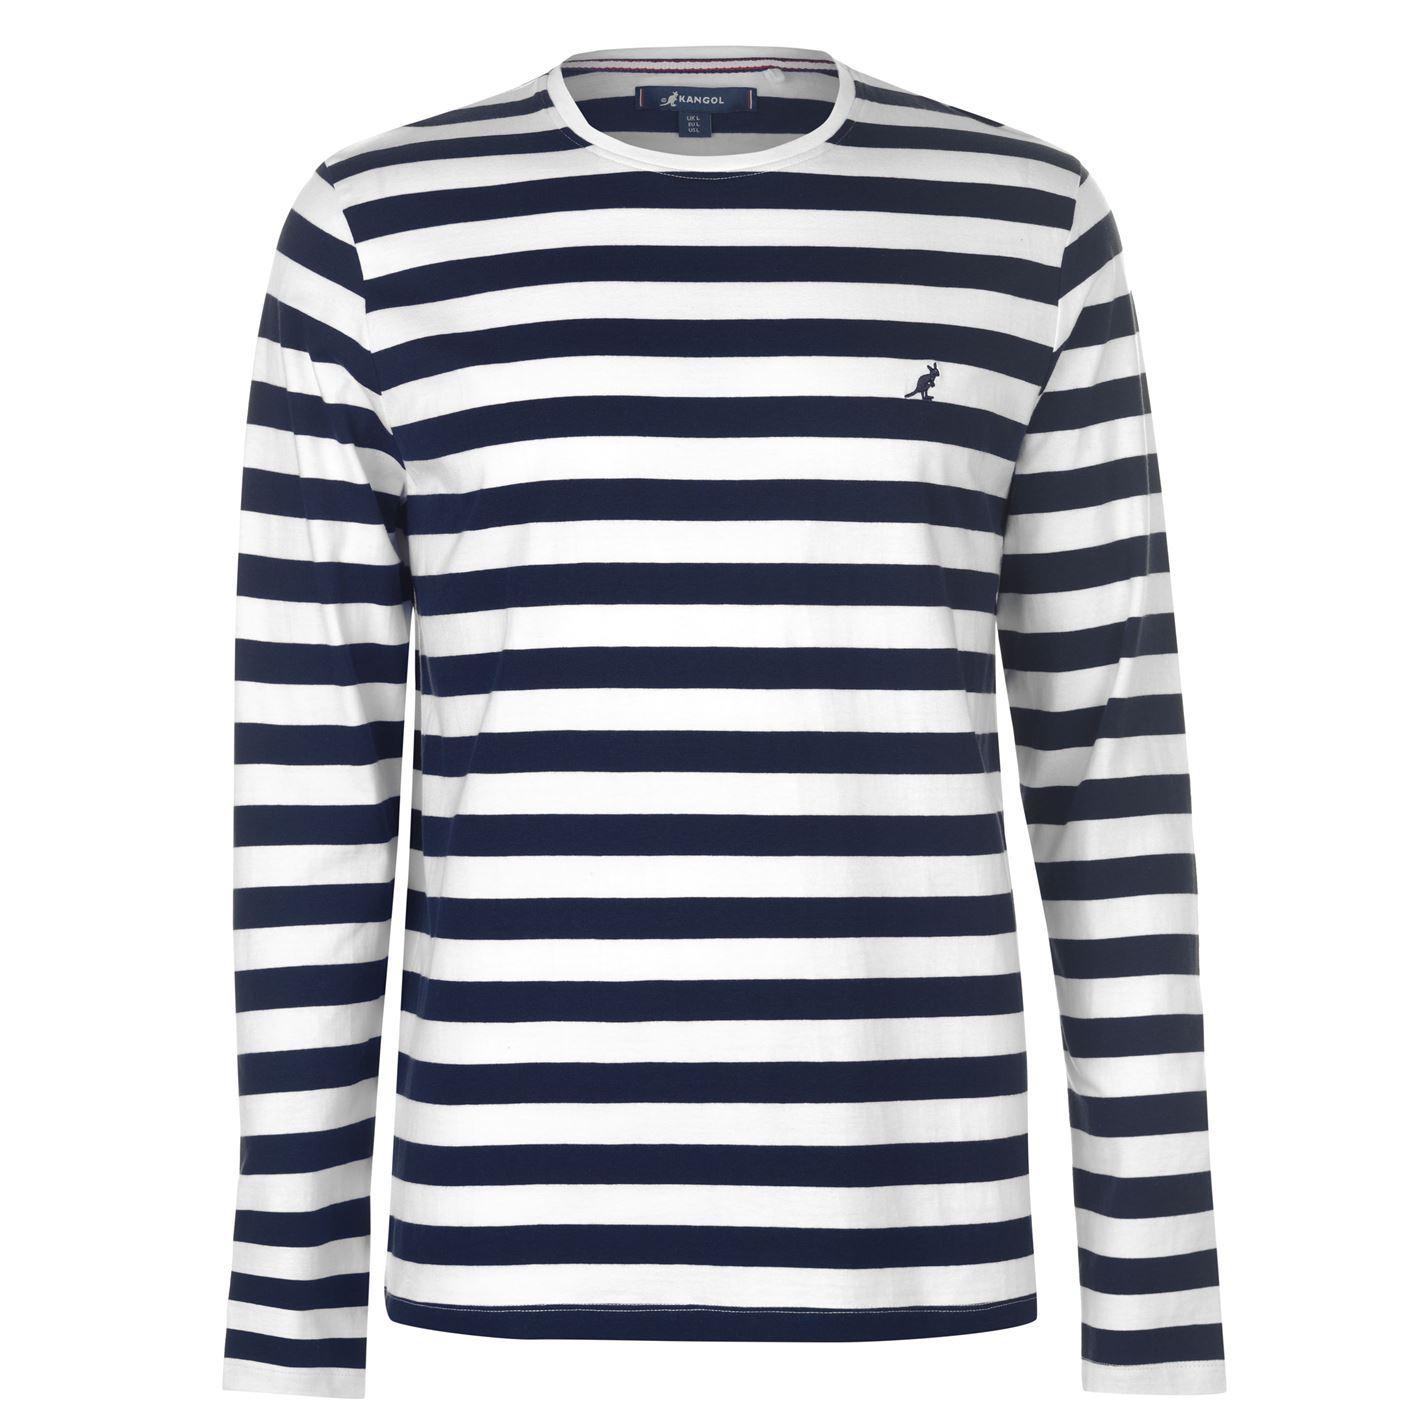 Kangol-Long-Sleeve-T-Shirt-Mens-Tee-Shirt-Top thumbnail 6